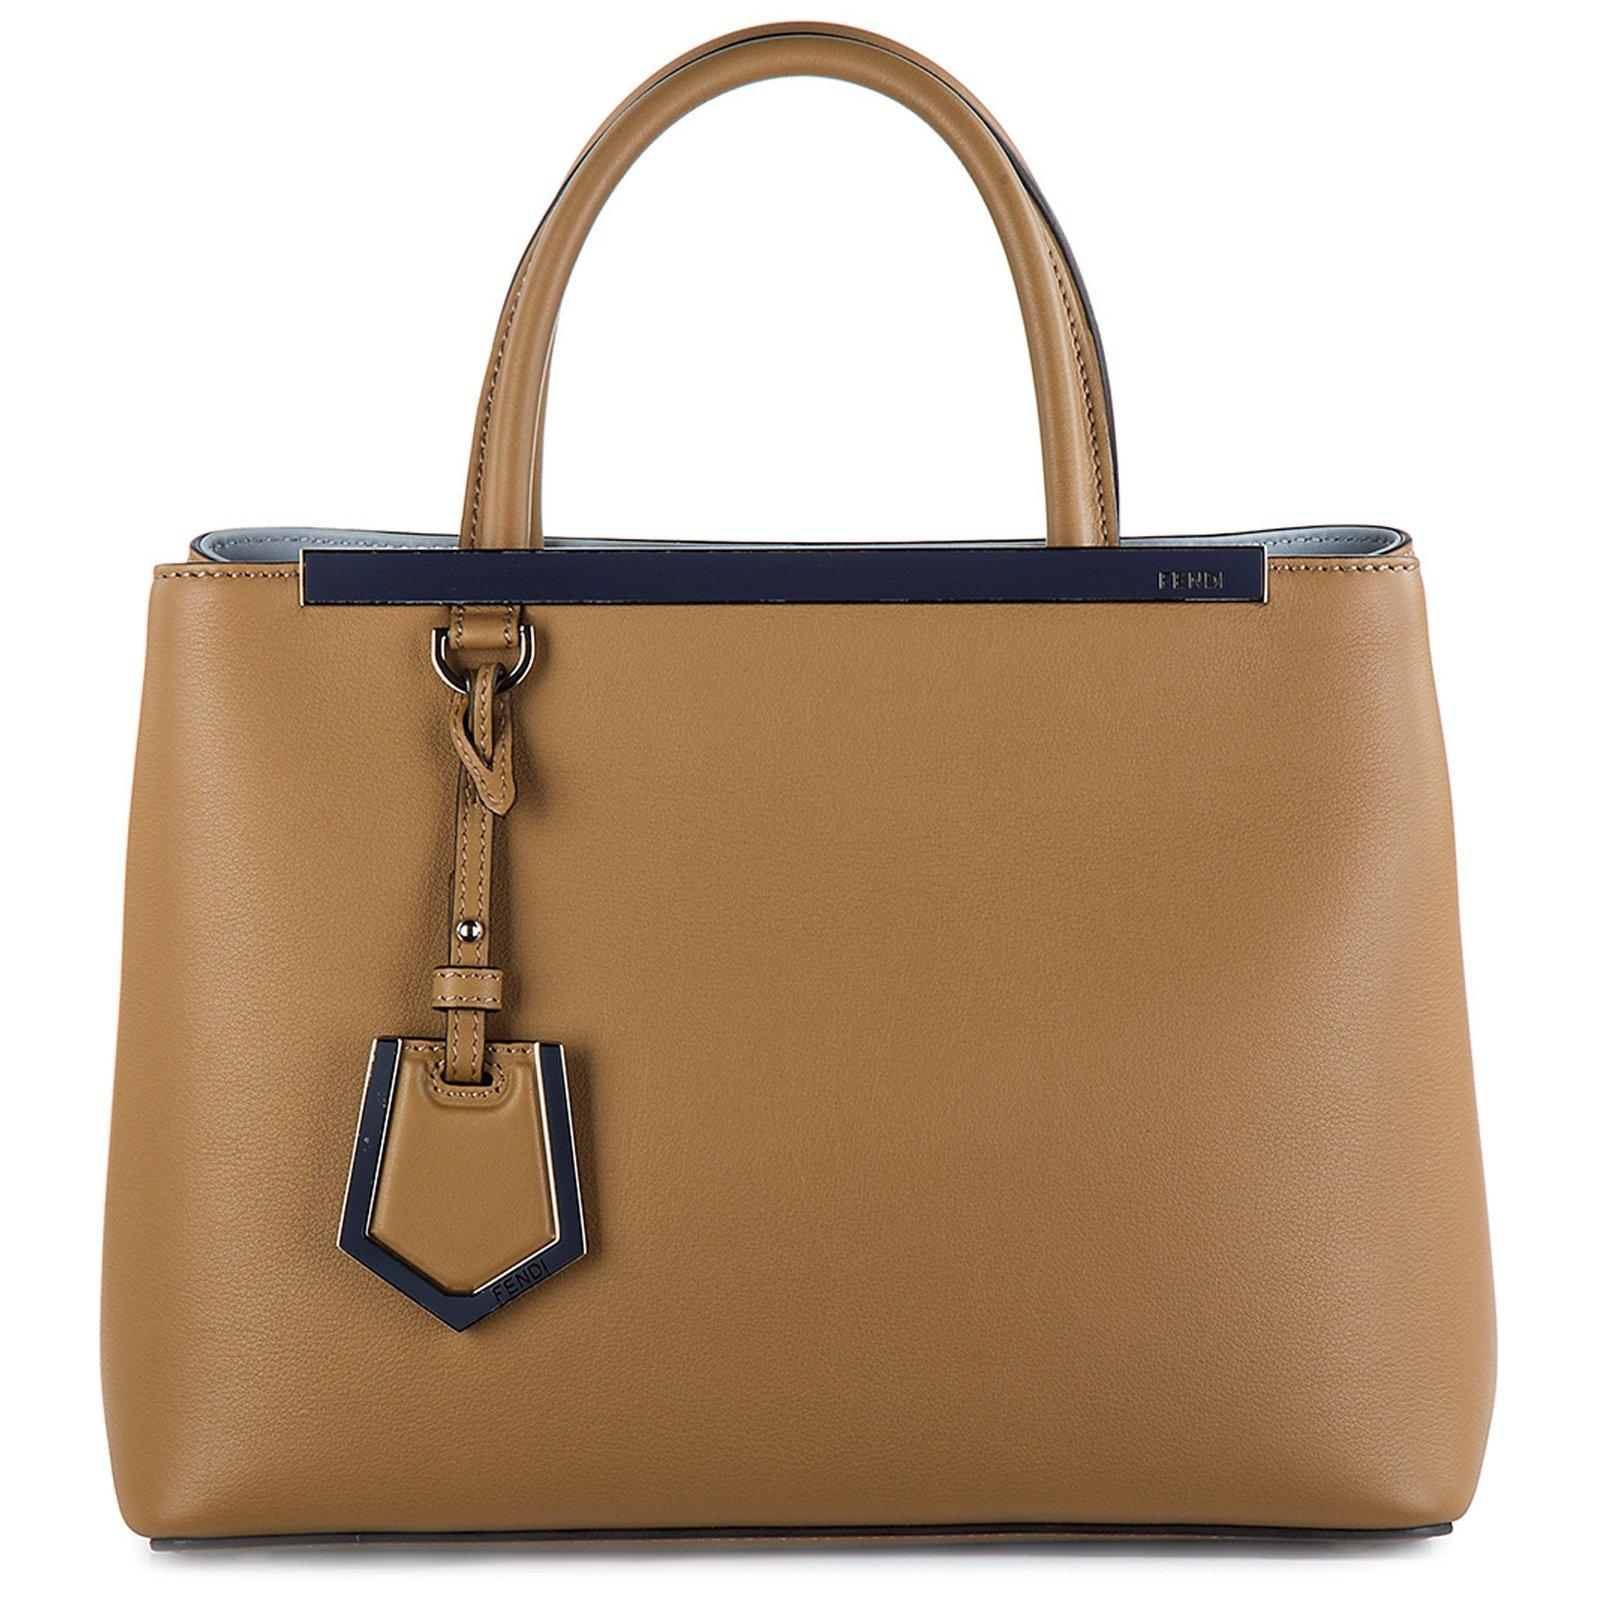 0d1d57d3c0 Fendi 2Jours Tote Bag In Brown | ModeSens